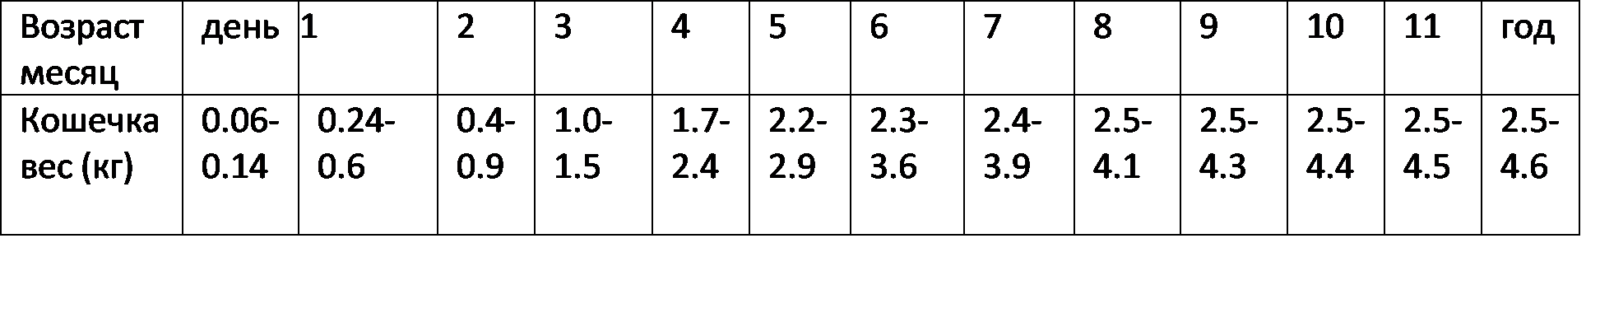 таблица с весом шотландских котят